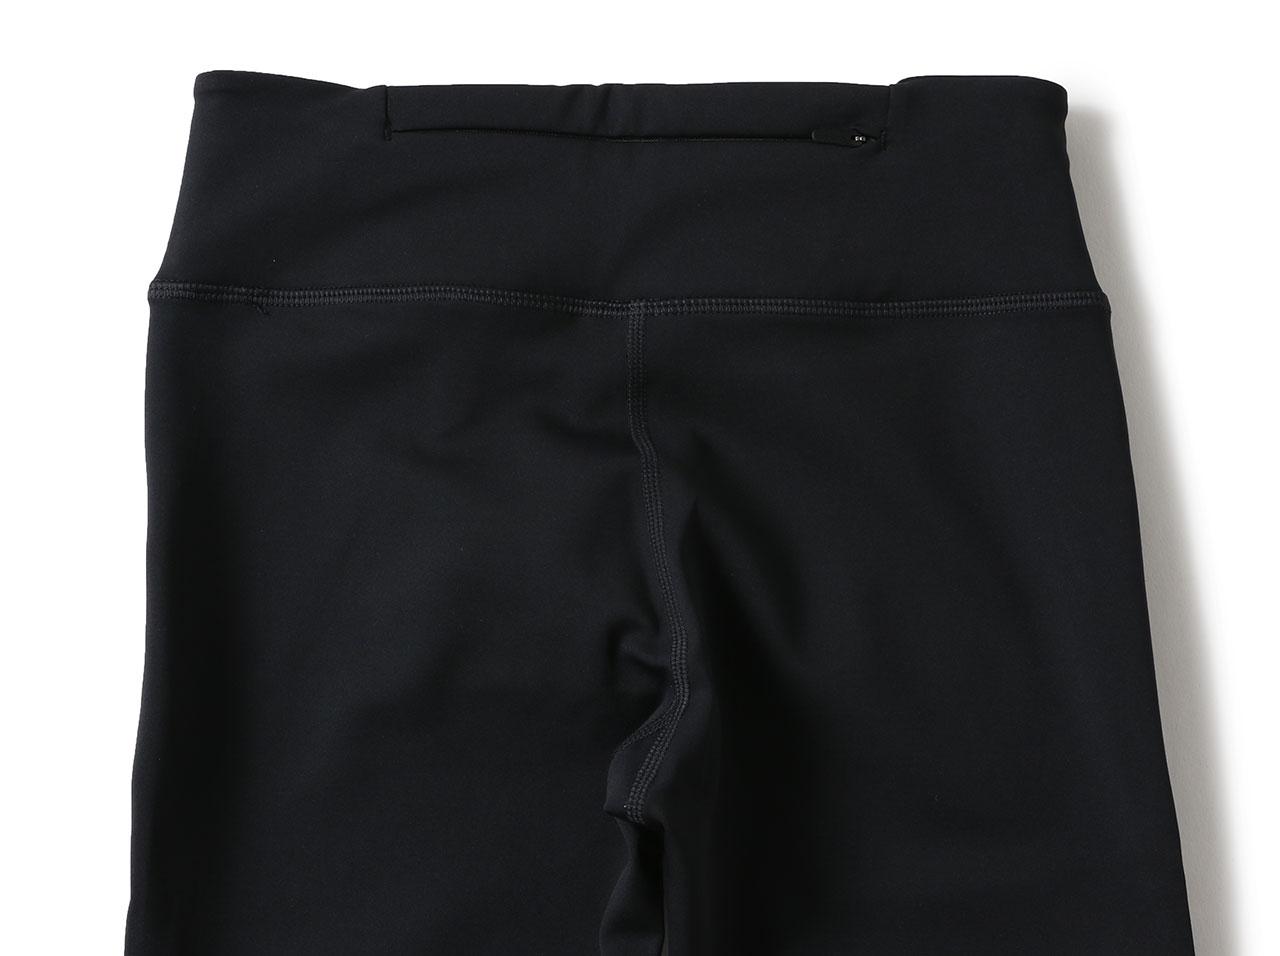 【SALE】NIKE WOMENS NRG SKELETON TIGHT - BLACK